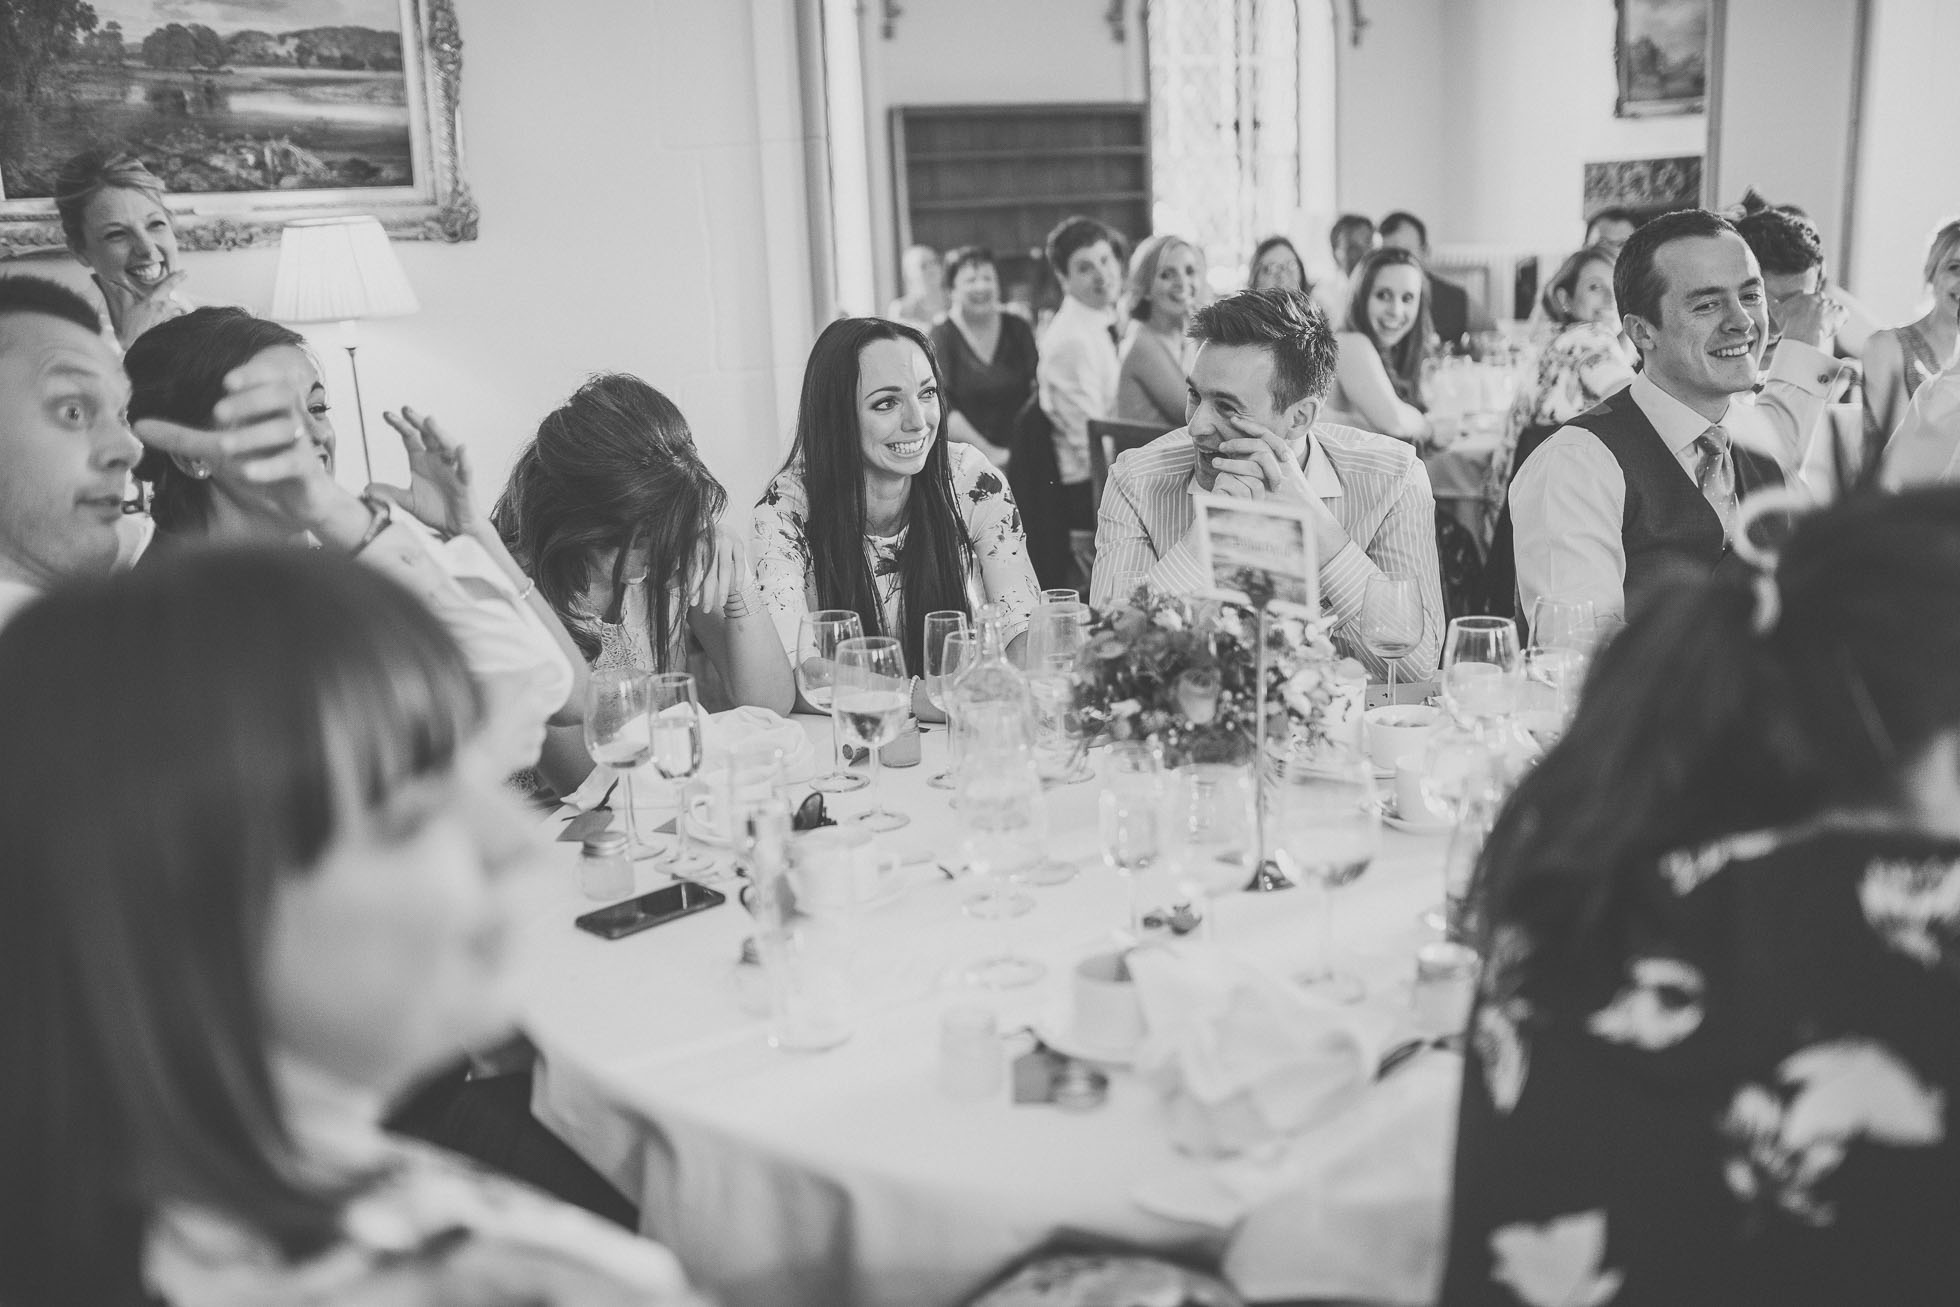 denton-hall-wedding-photographer-55.jpg